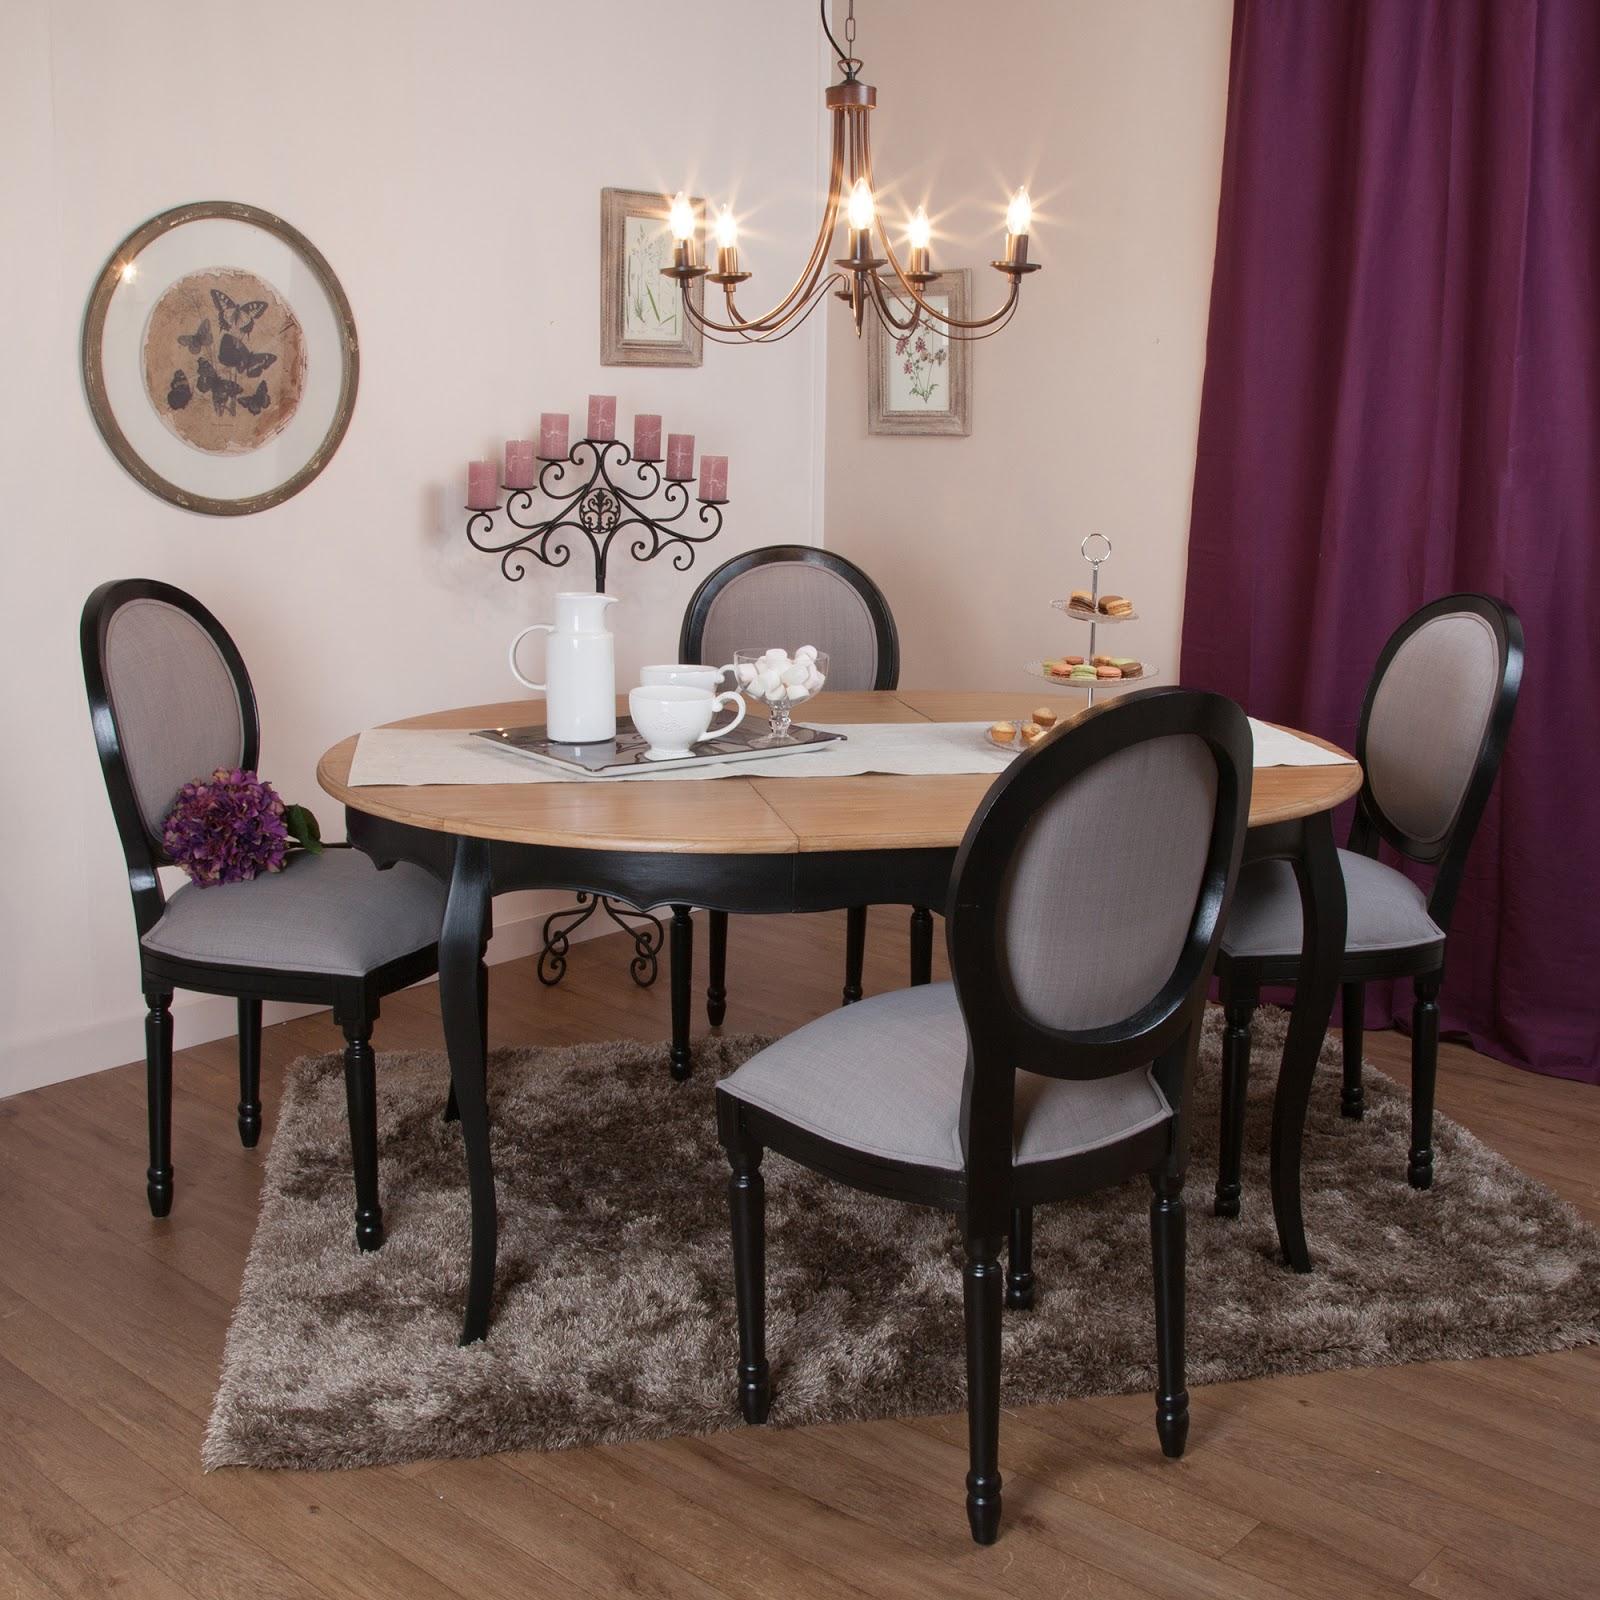 Salle manger compl te avec table ronde salle manger for Table salle manger art deco